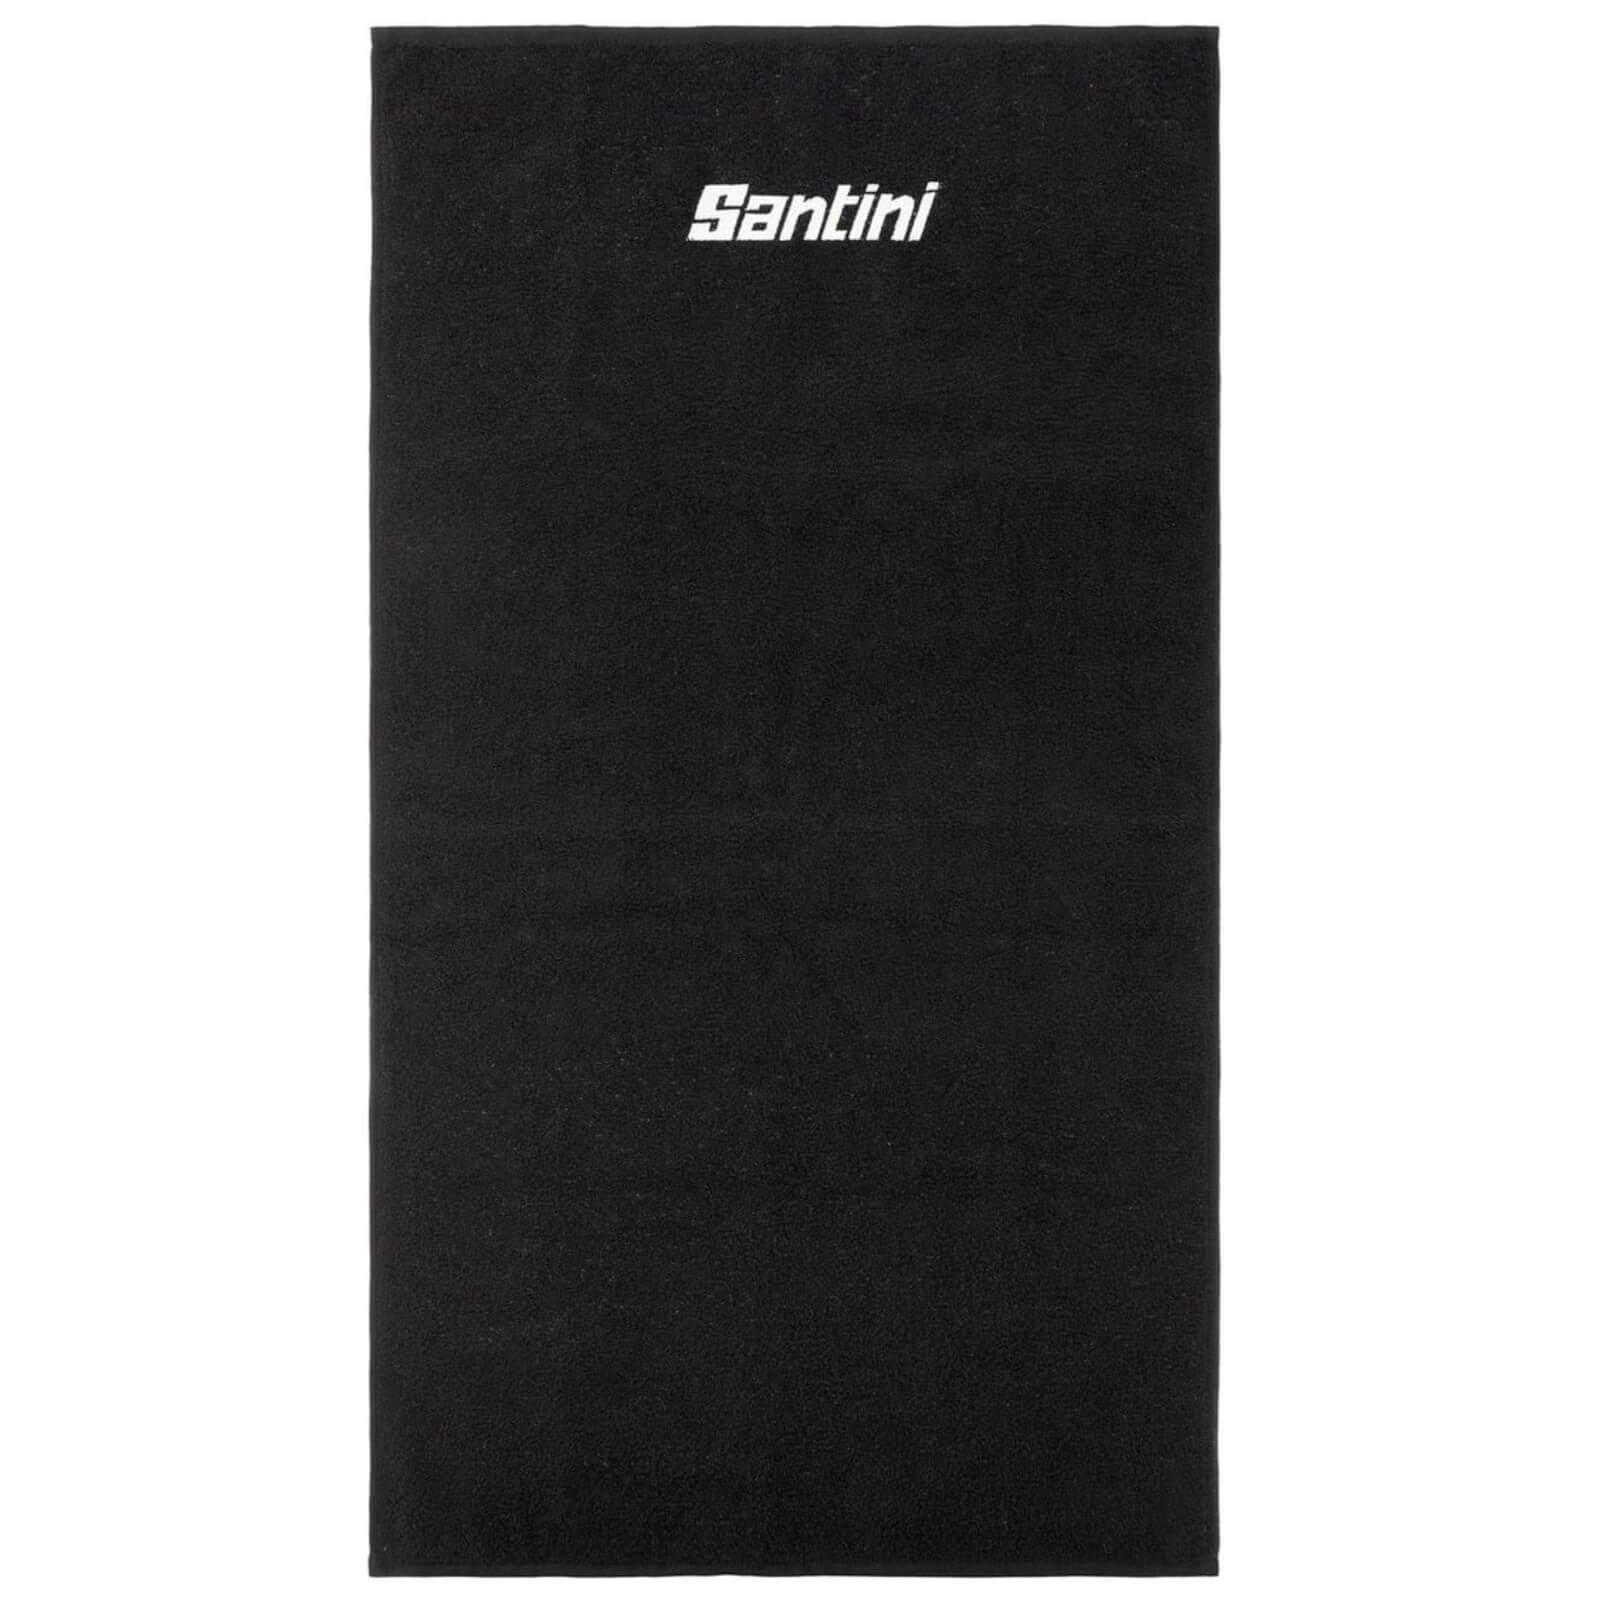 Santini Indoor Towel